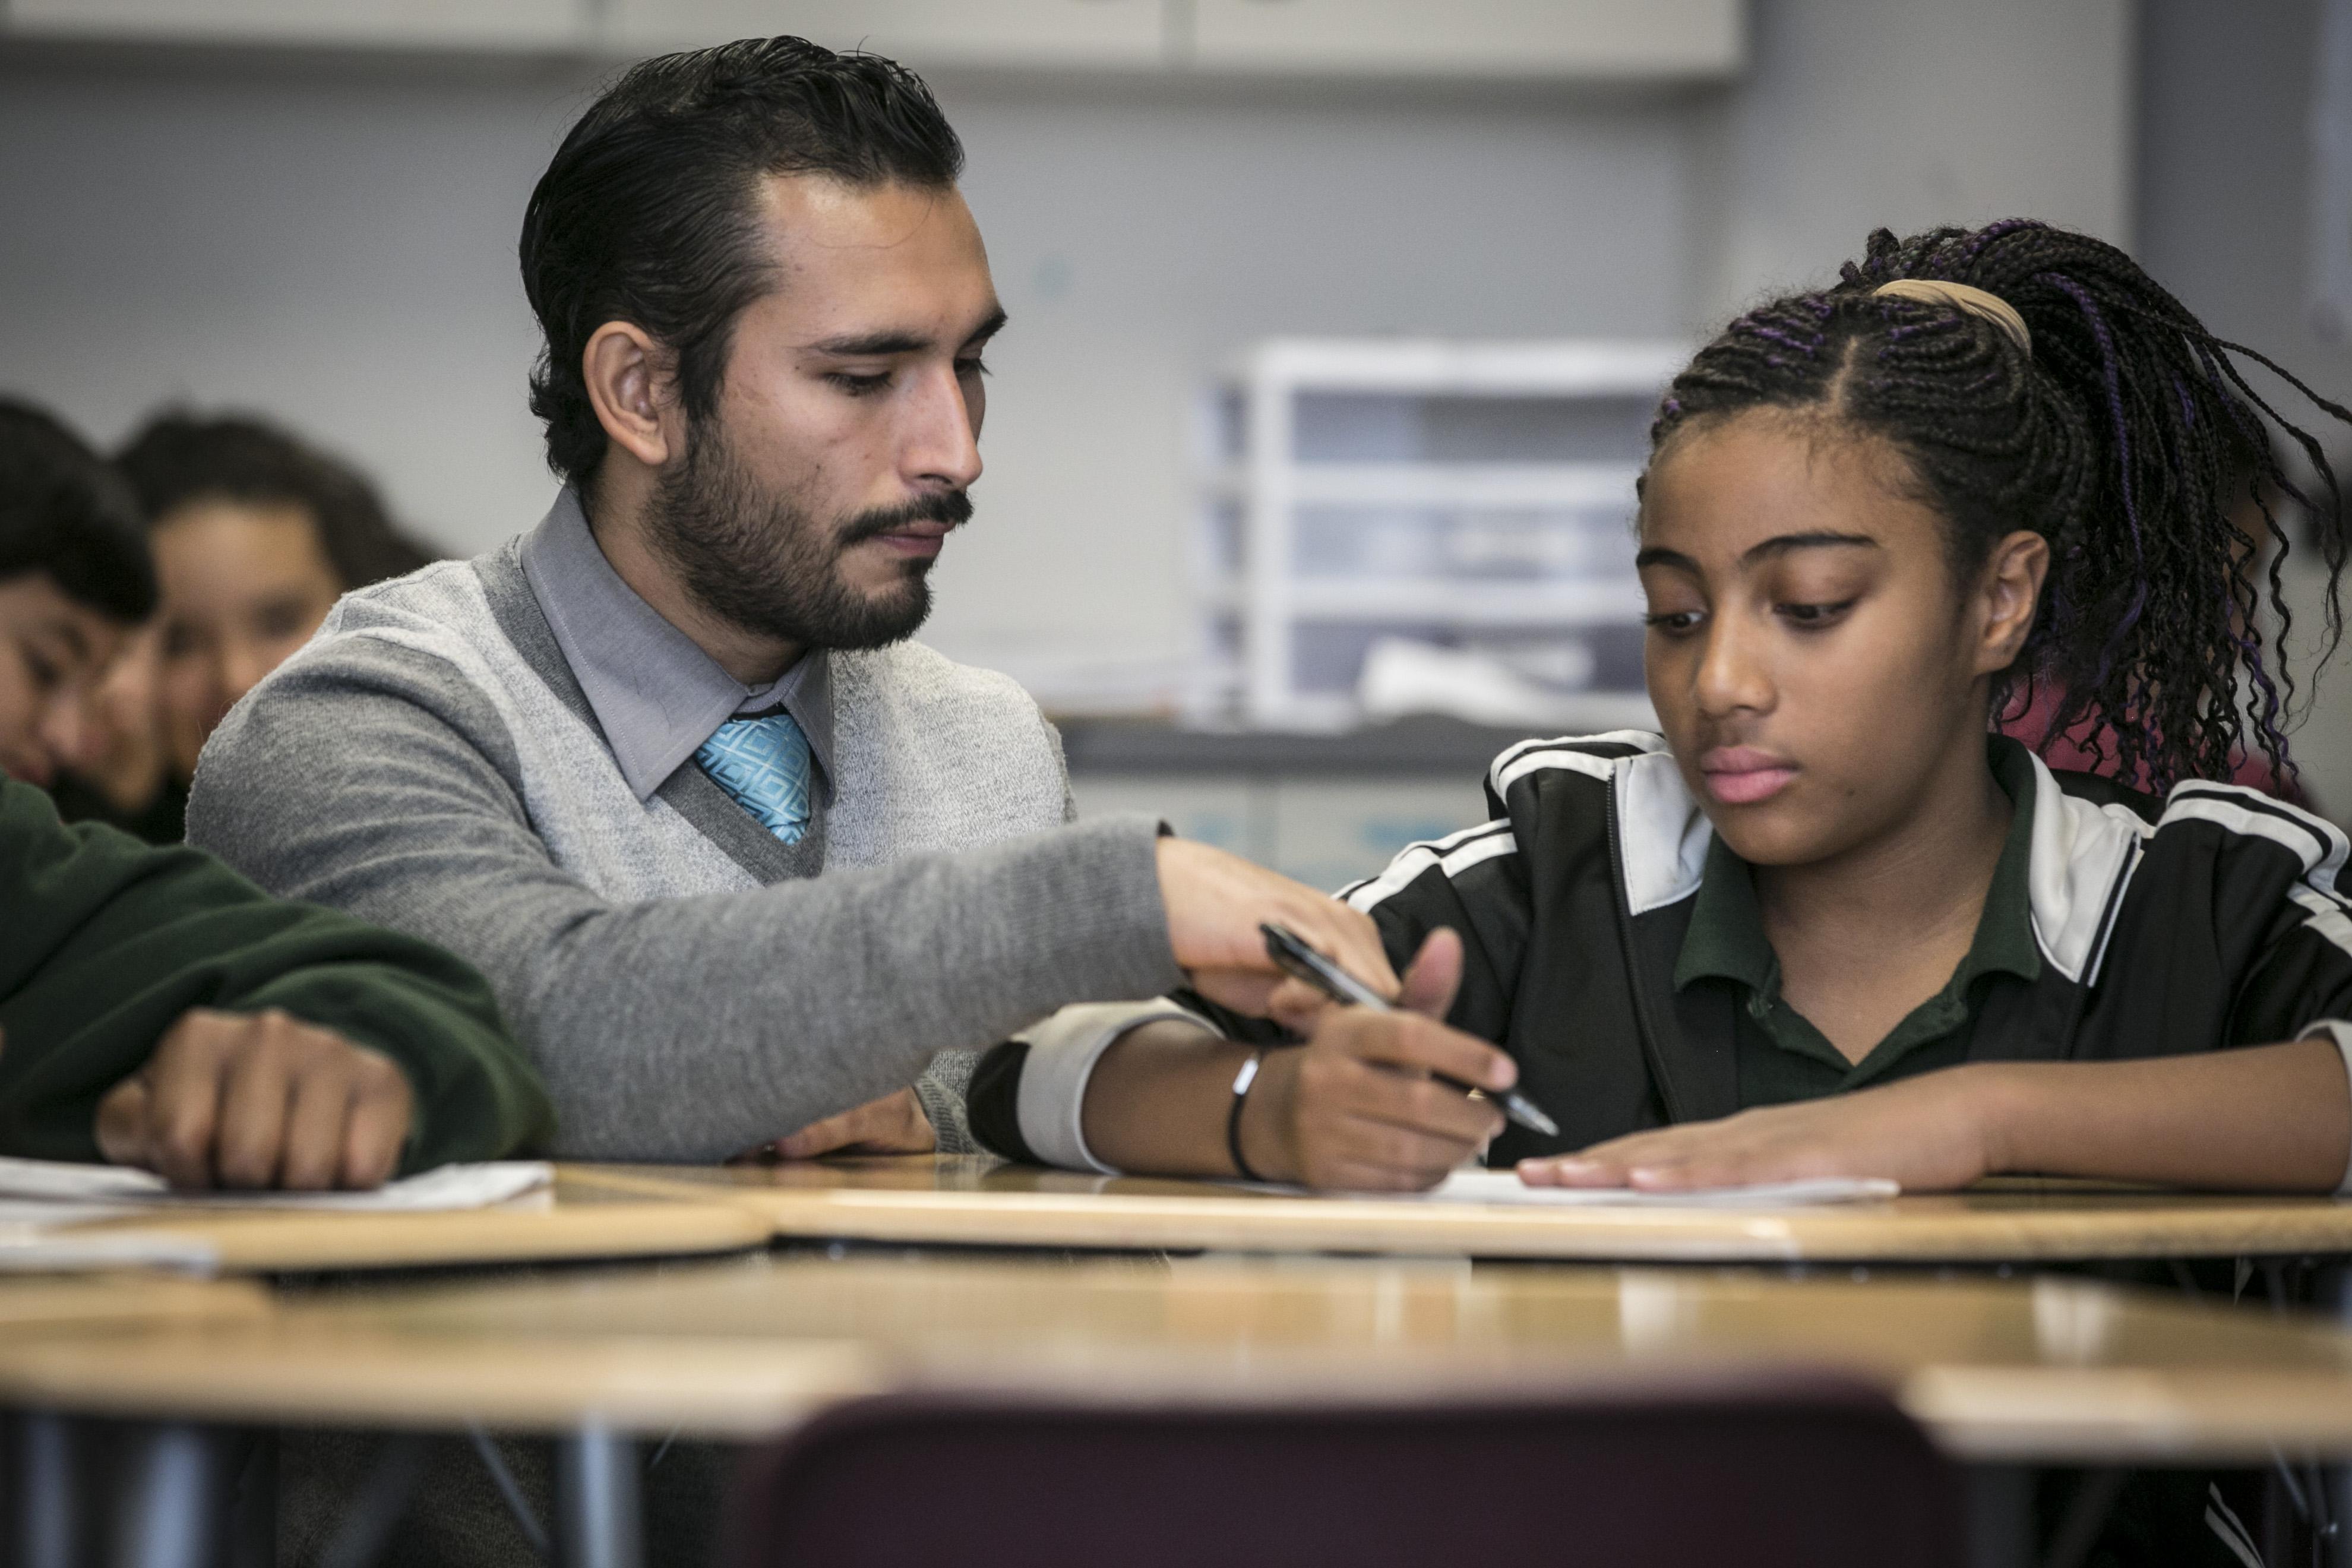 Photo: Denver teachers post-Trump 2 | Alejandro Fuentes